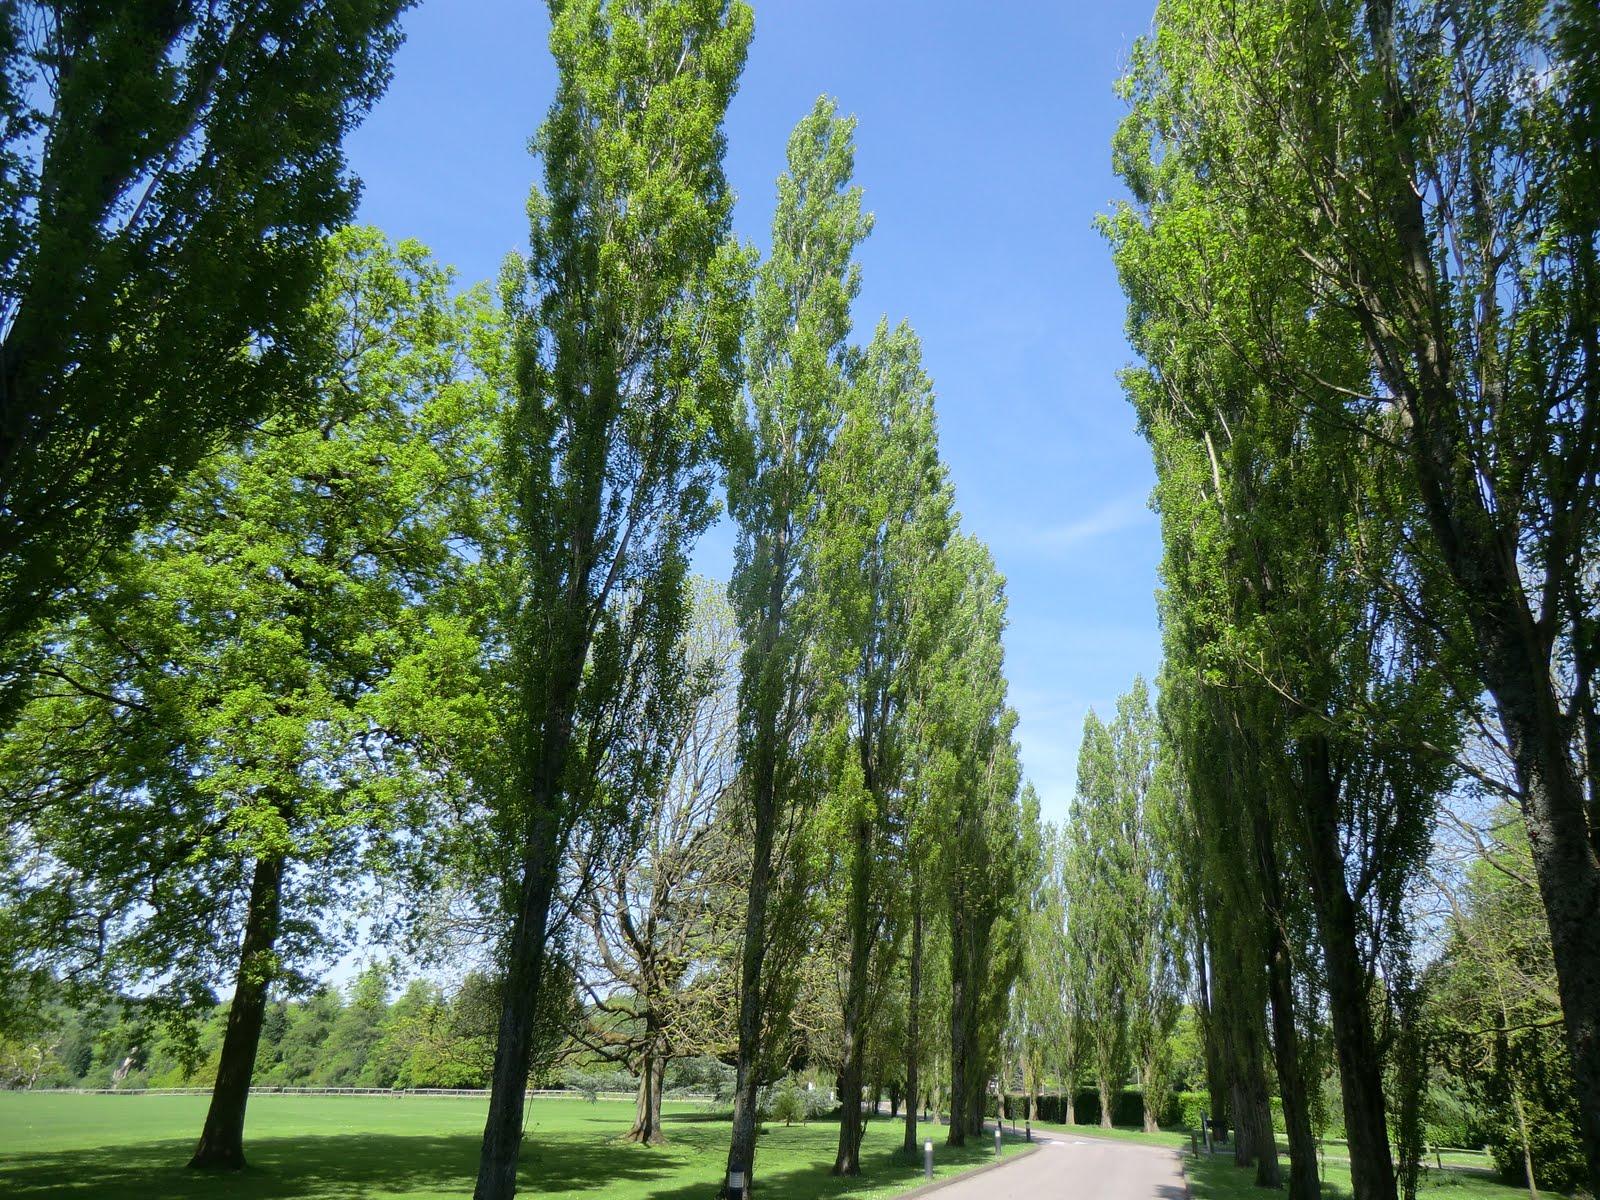 CIMG6810 Avenue of poplars, Gatton Park